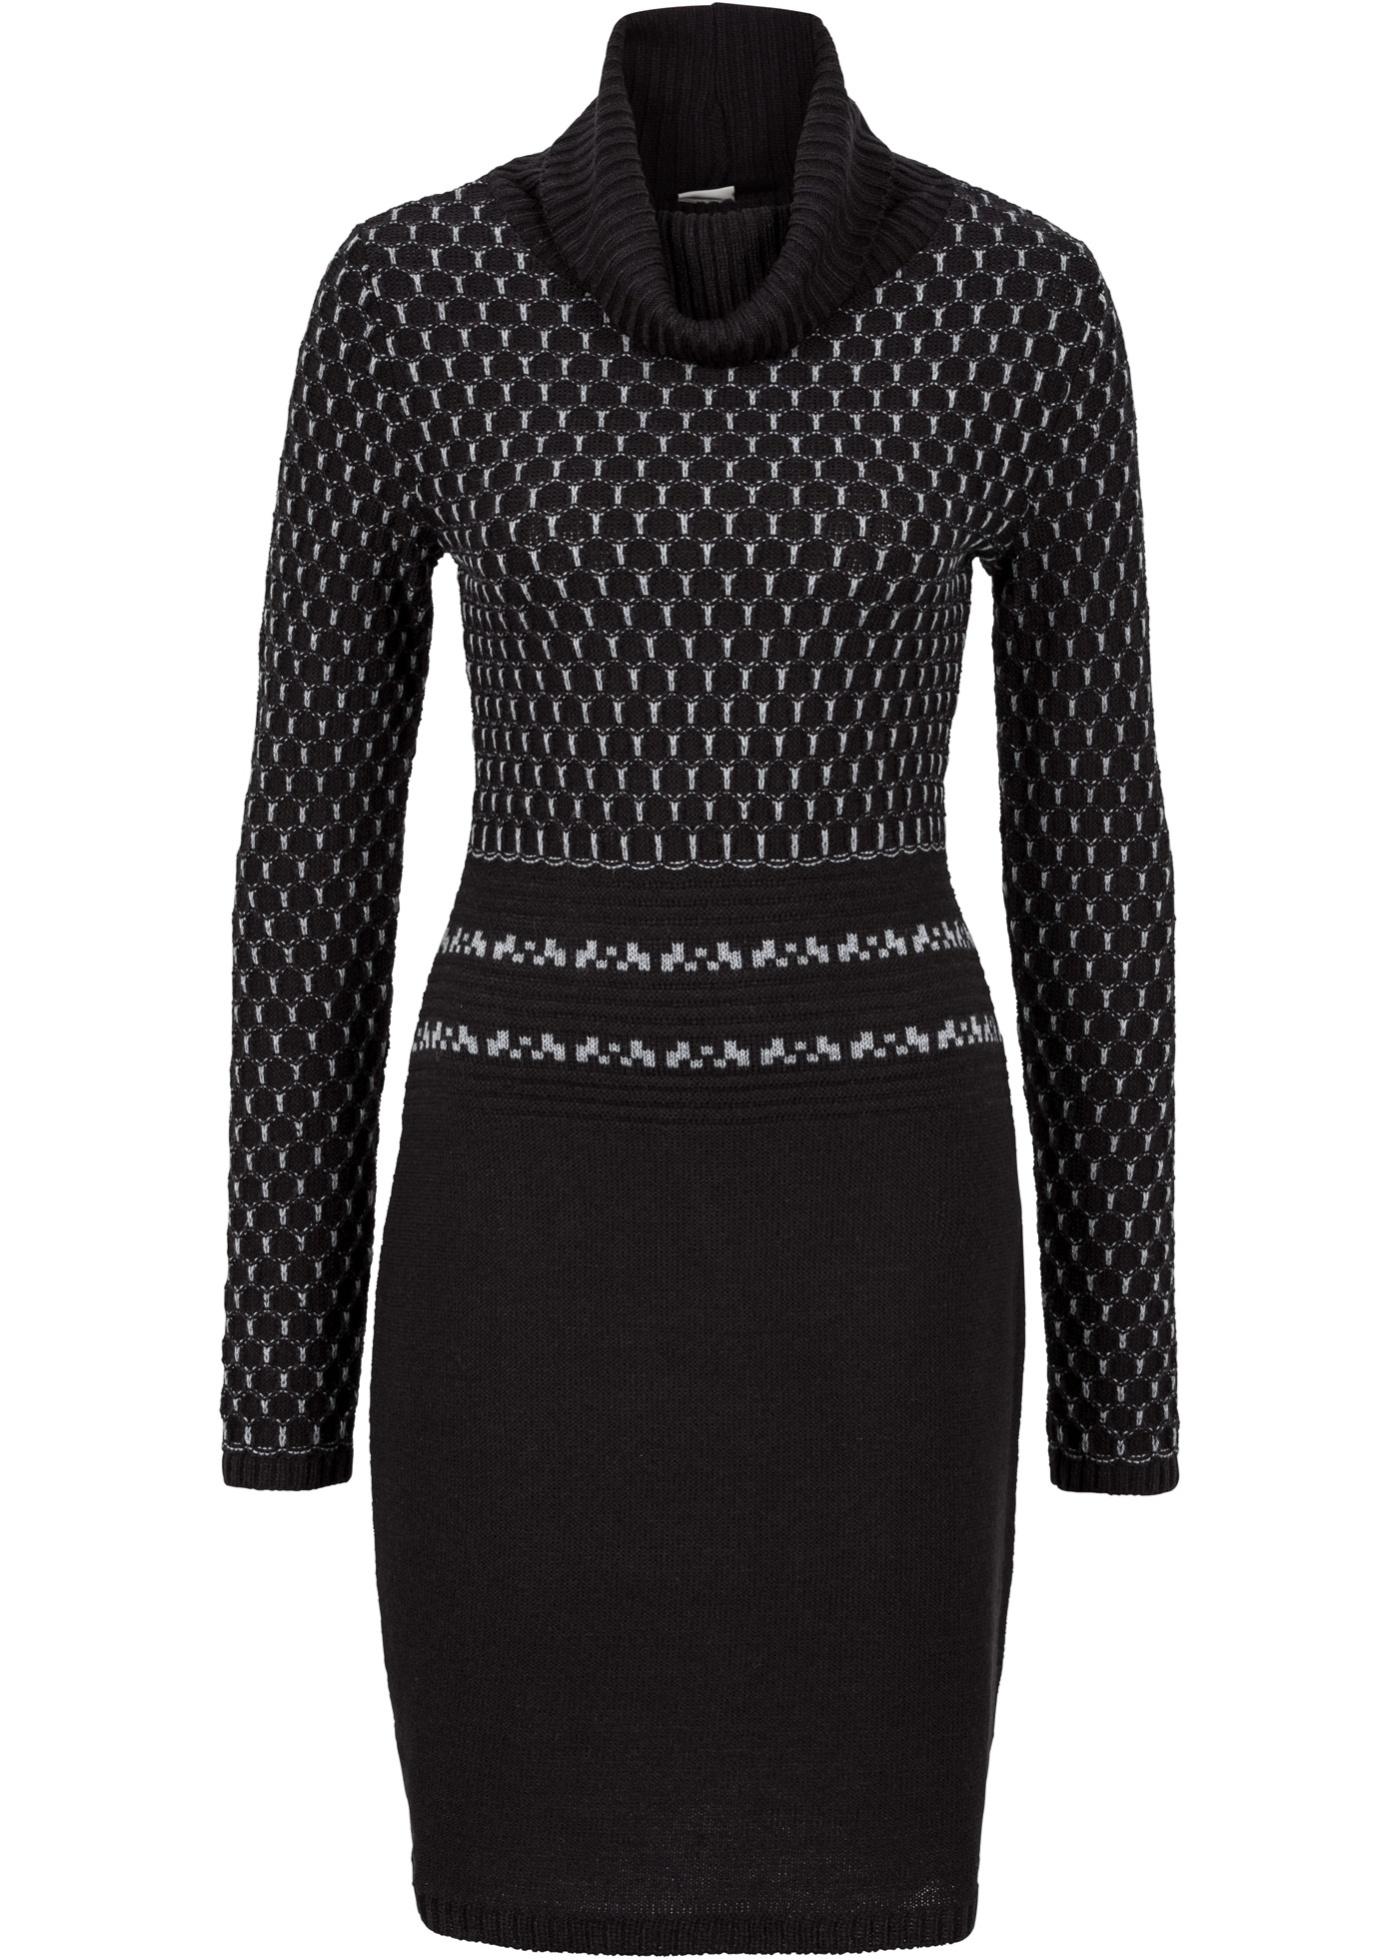 feminines langarm strickkleid kleid mit rollkragen schwarz grau gr 40 42 art89. Black Bedroom Furniture Sets. Home Design Ideas